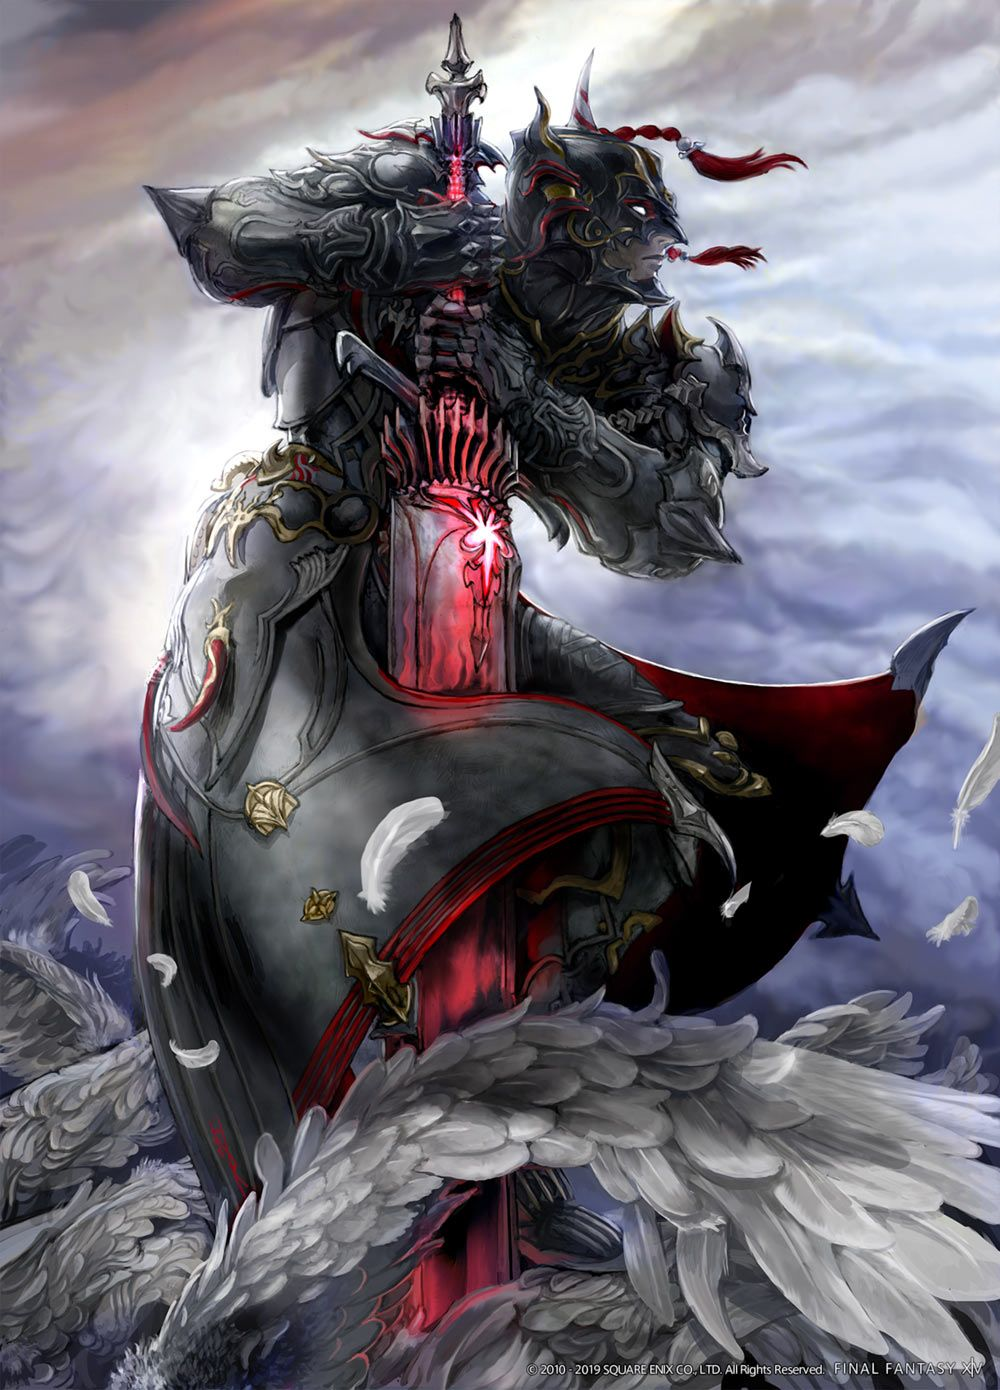 Warrior Of Darkness Promo Art From Final Fantasy Xiv Shadowbringers Art Artwork Gaming Videogames Gam Final Fantasy Art Final Fantasy Xiv Final Fantasy X